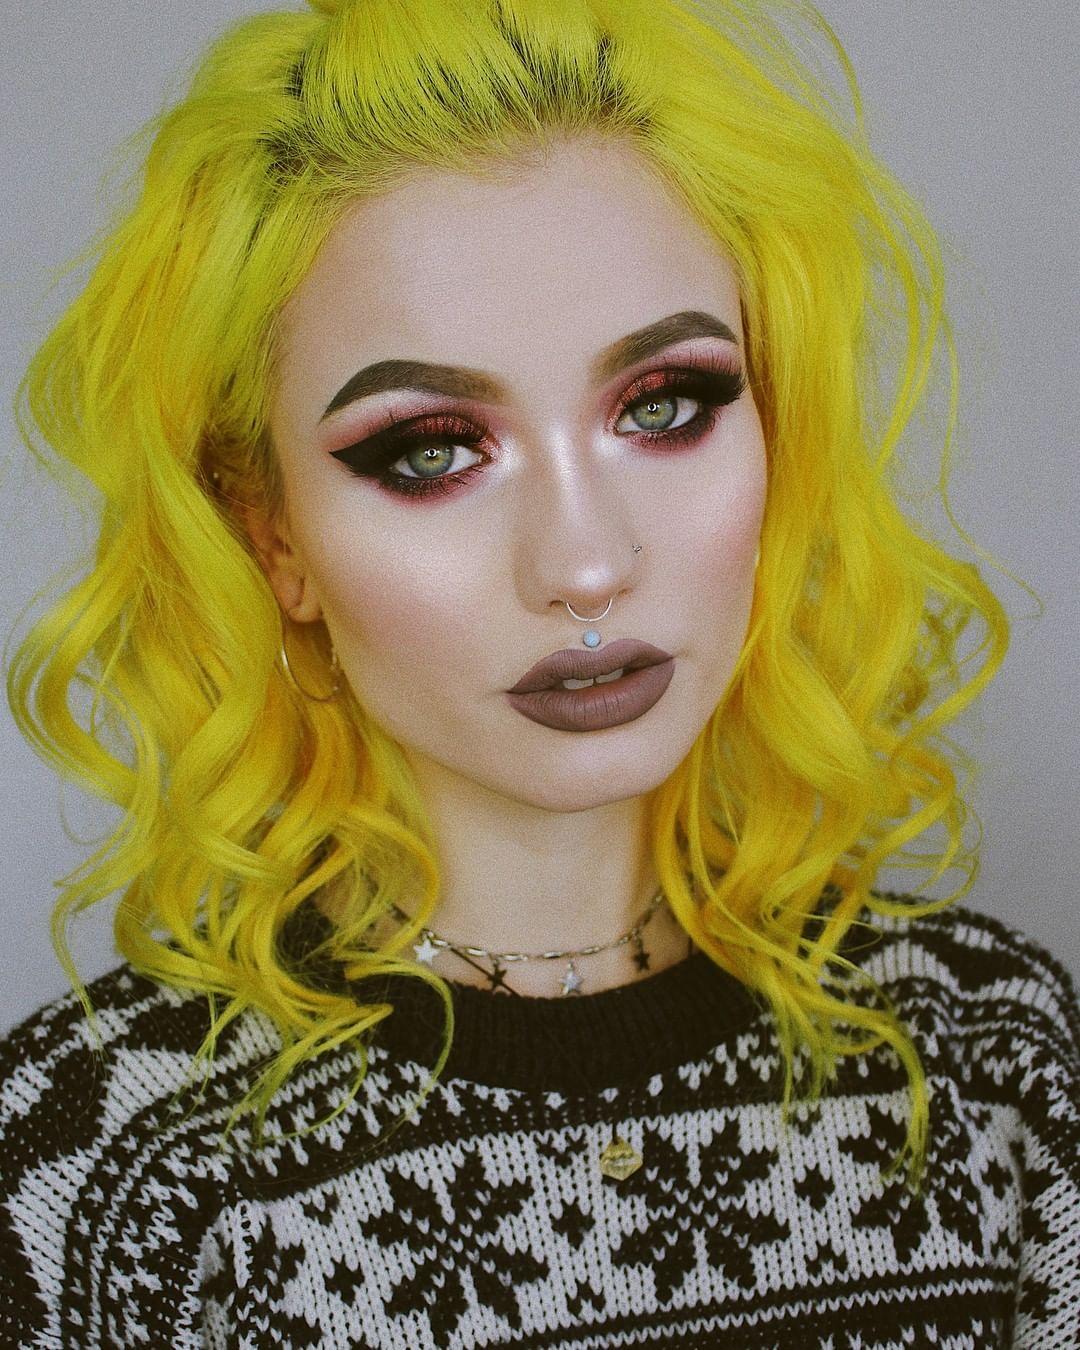 Sn0ok S Signature Neon Yellow Hair Really Makes Those Green Eyes